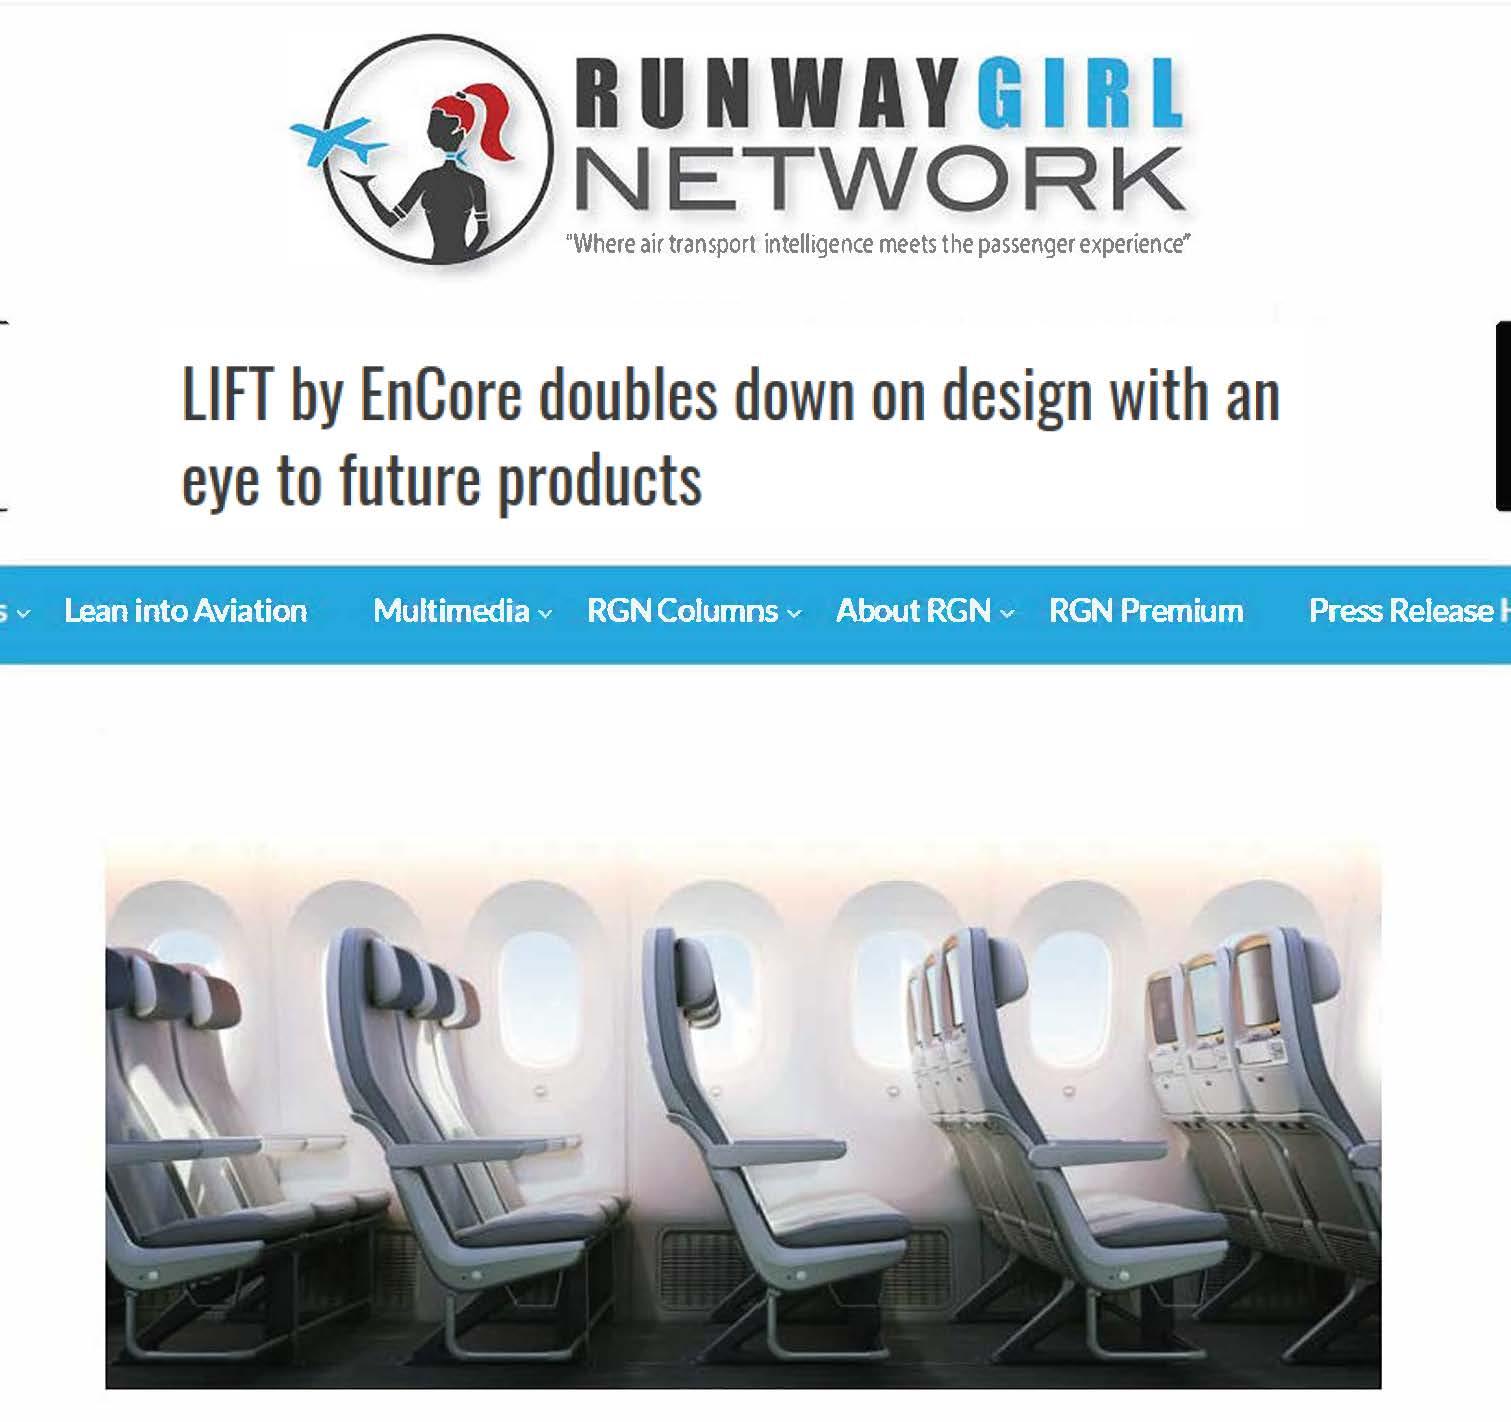 Runway Girl Network - Nov 2017